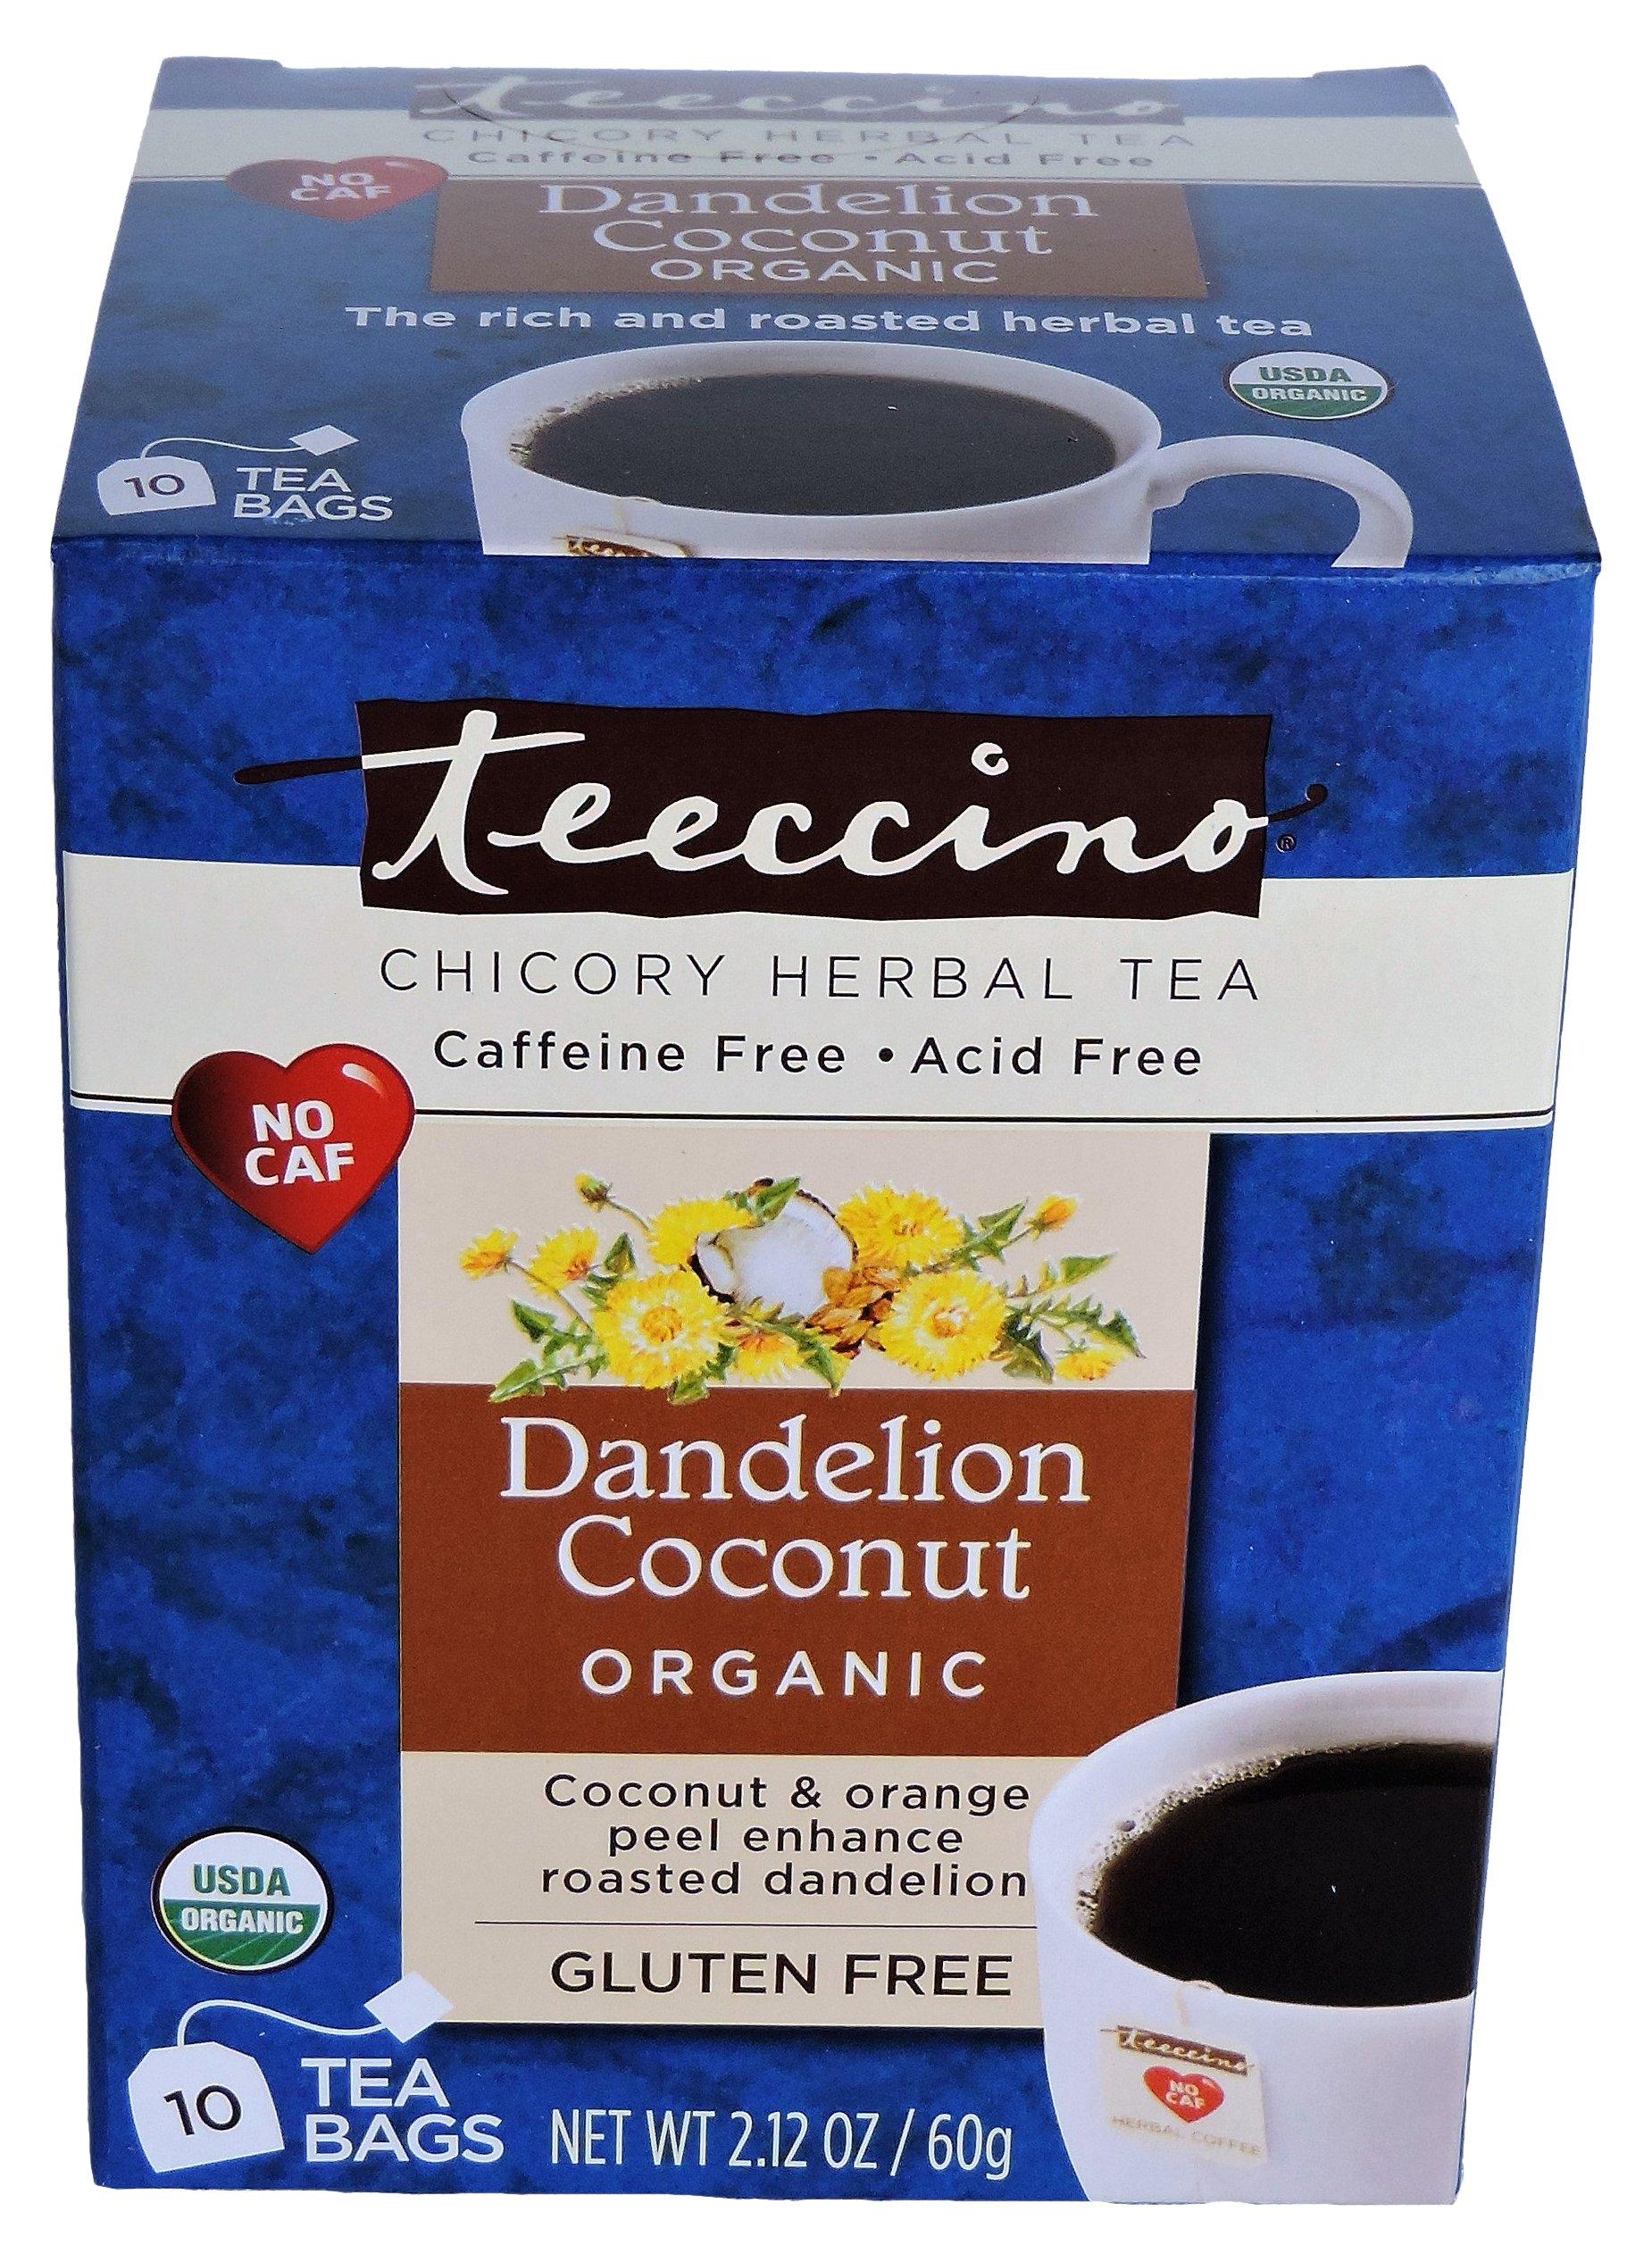 Teeccino Organic Dandelion Coconut Herbal Tea Bags, Certified Organic, Gluten Free, Caffeine Free, Acid Free, 10 Count